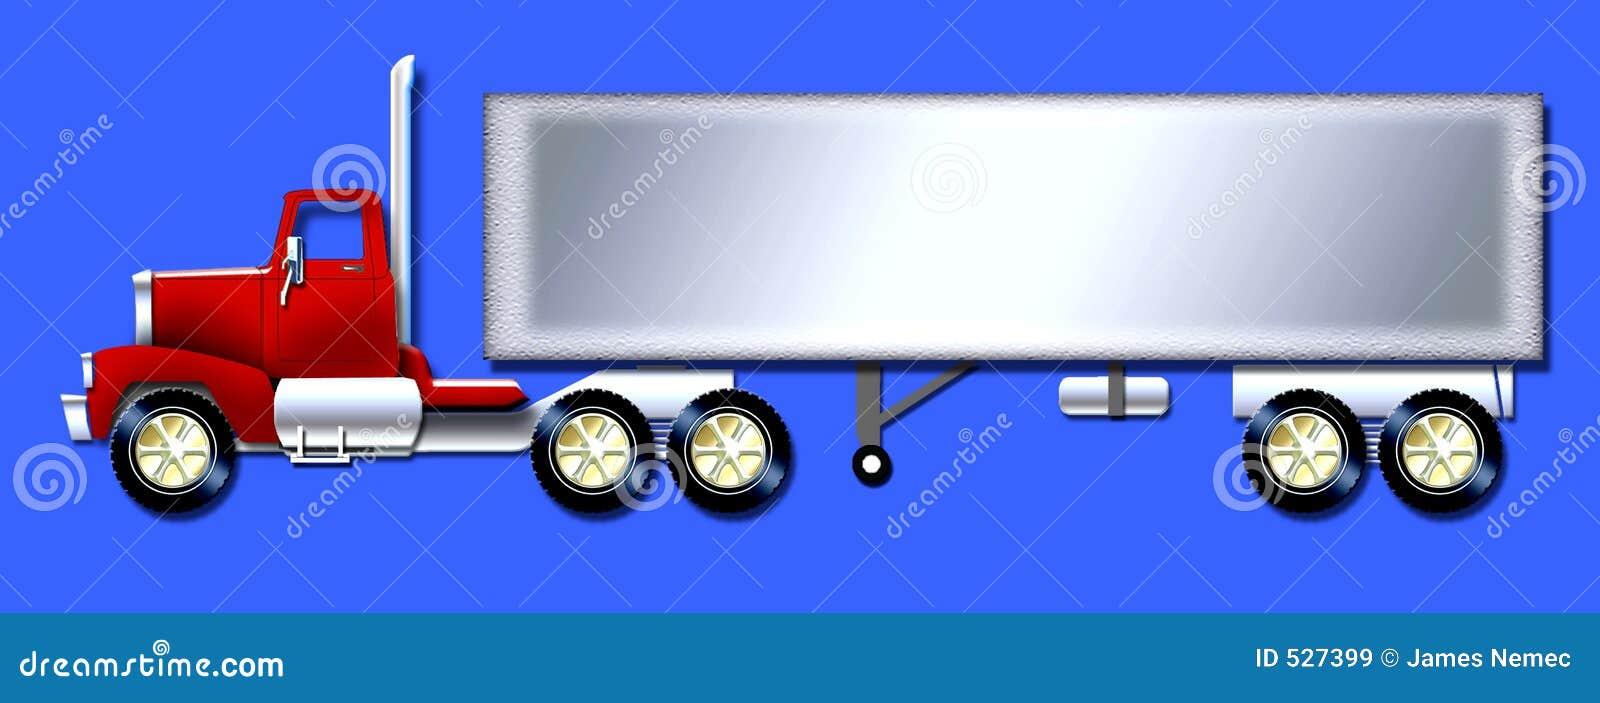 Download 半拖车卡车 库存例证. 插画 包括有 卡车, 传送, 转存, 运输, 拖拉机, 拖车, 运费, 半拖车, 承运人 - 527399